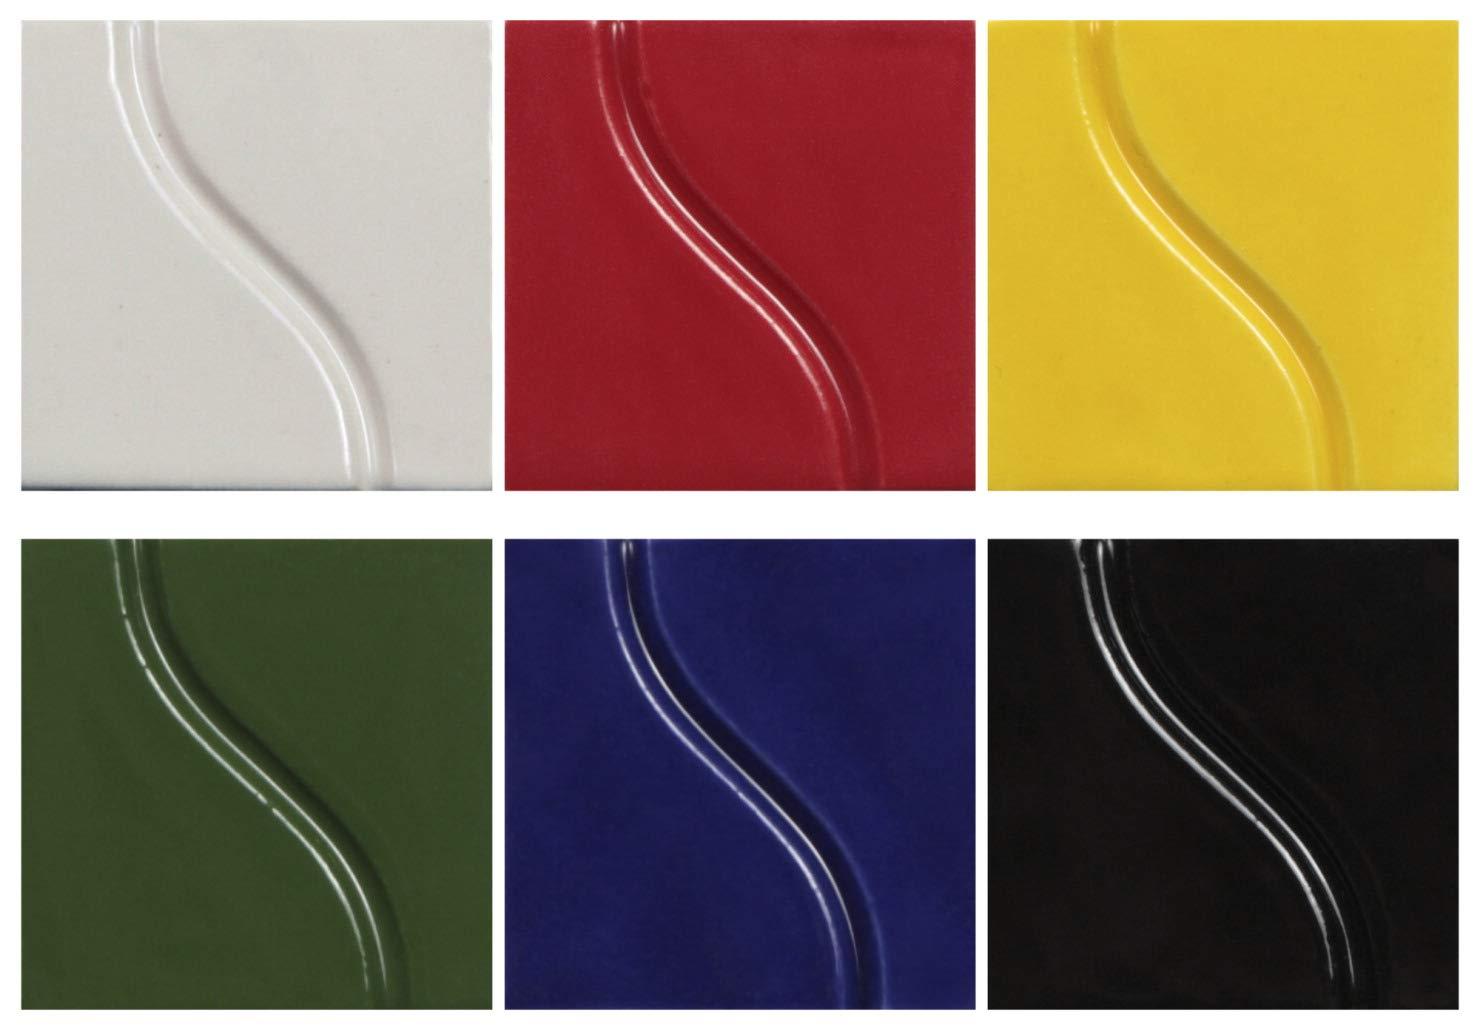 Sax True Flow Gloss Glaze Set, Assorted Colors, Set of 6 Pints by Sax